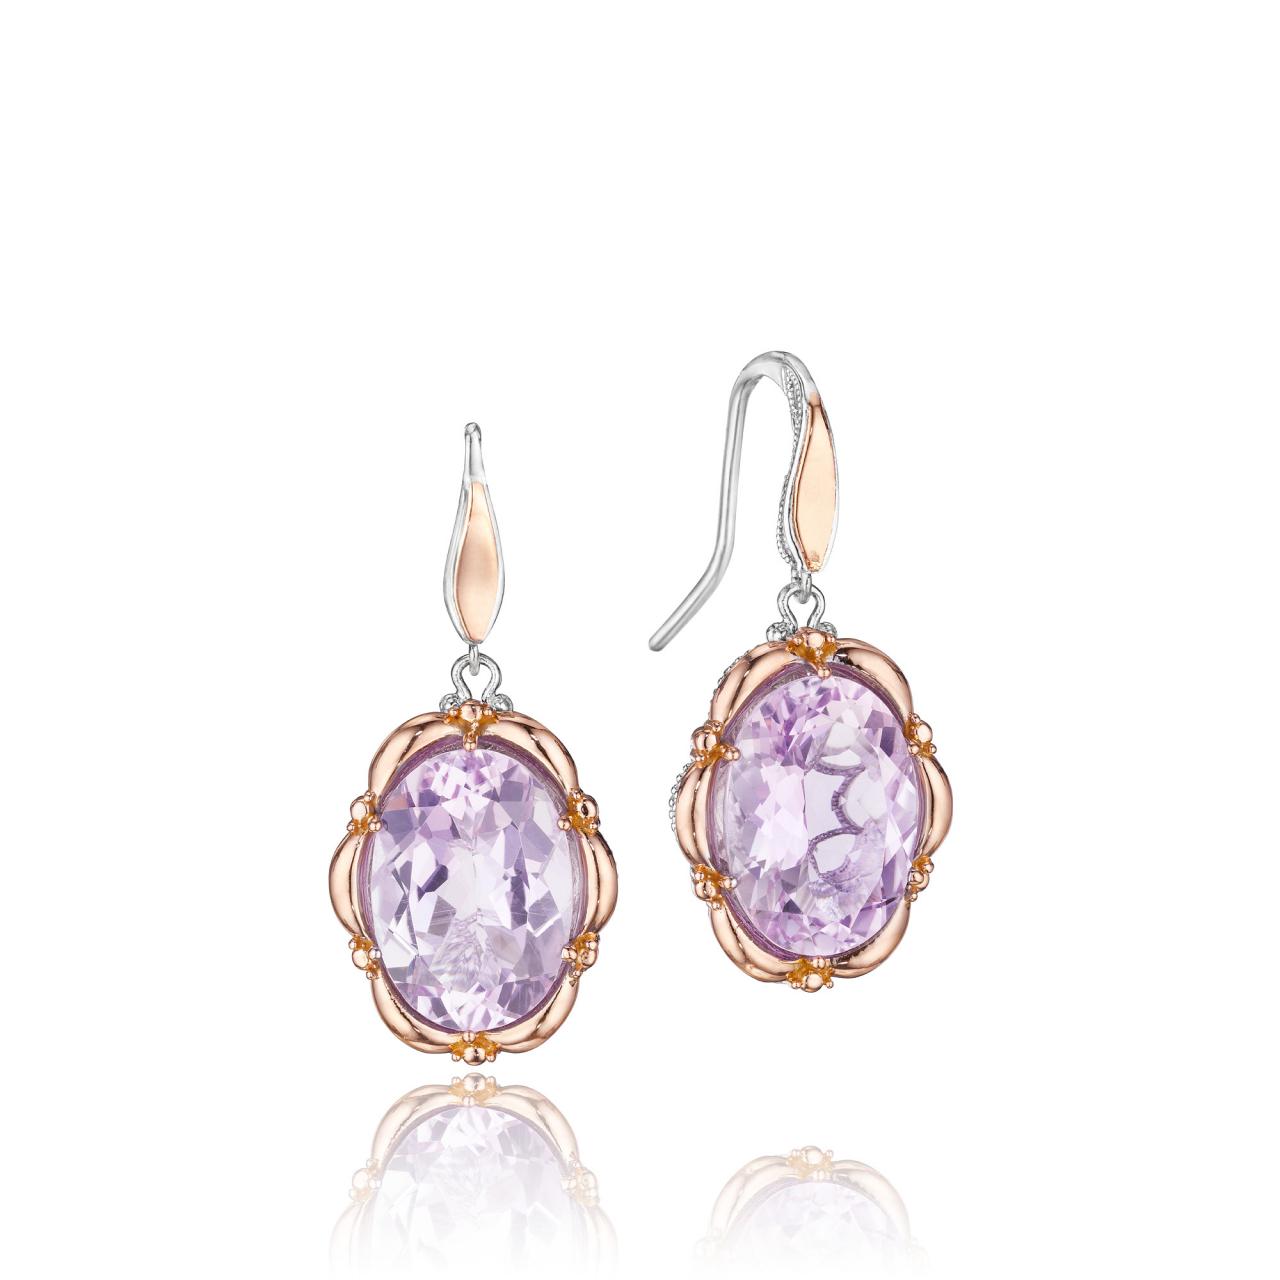 Windsor Jewelers - TACORI 18K/925 Rose Amethyst Dangle Earrings, $580.00 (http://www.windsor-jewelers.com/tacori-18k-925-rose-amethyst-dangle-earrings/)